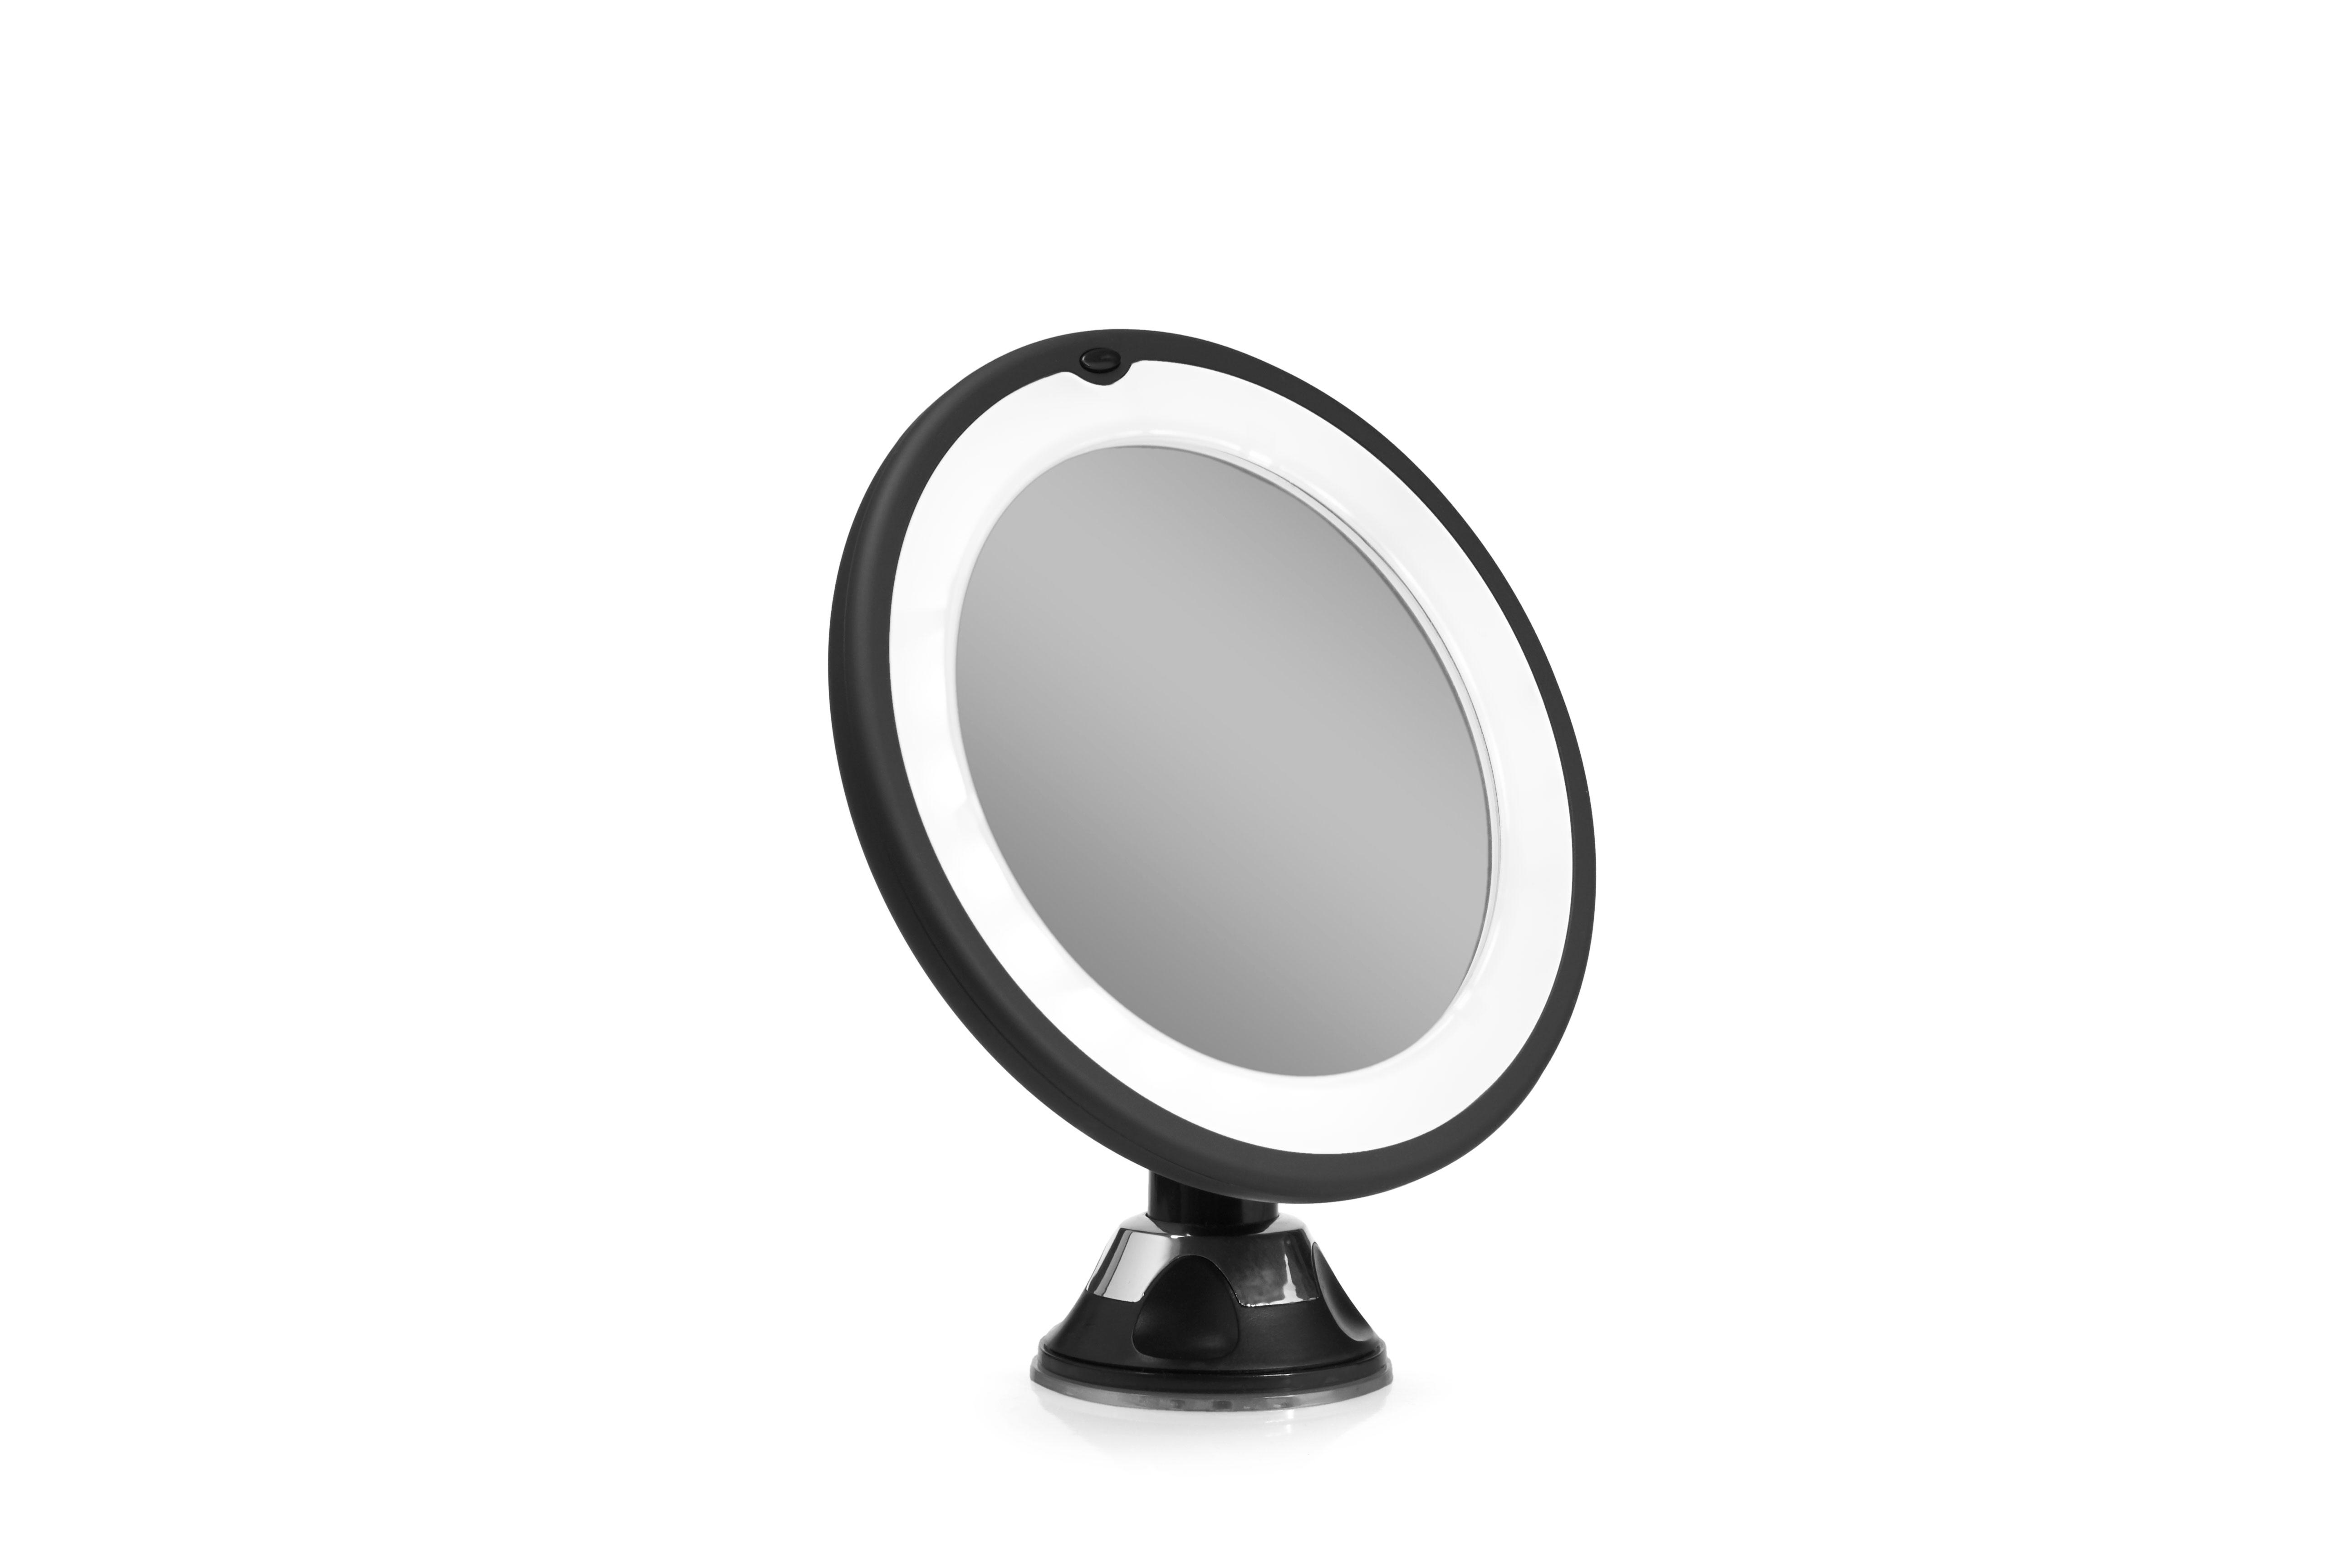 Gillian Jones Spejl Med Lys, x7 forstørrelse